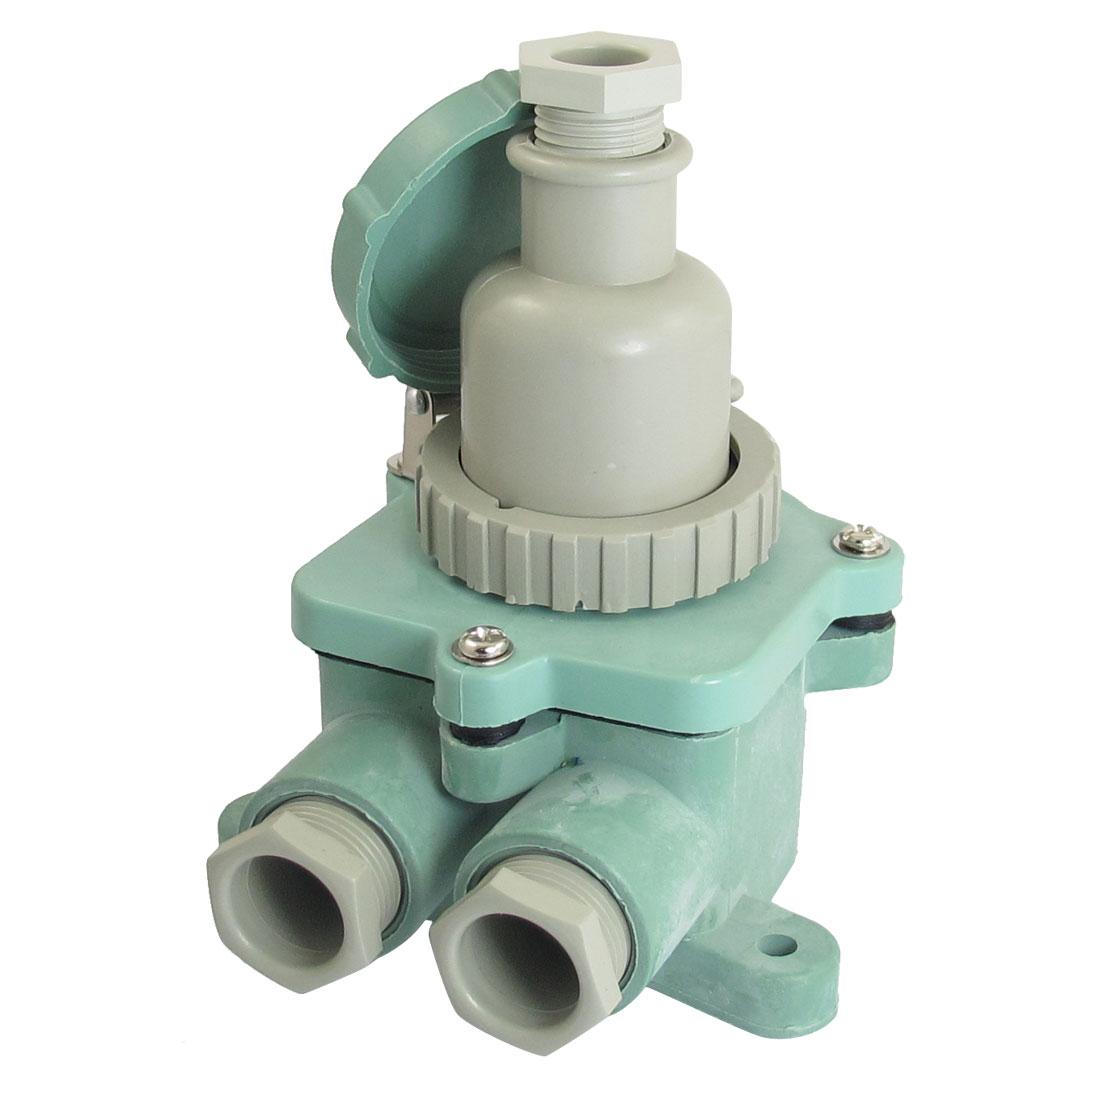 AC 250V 20A 2P+E Water Resistant Marine Plug Socket Set Z-1M/T-1MA